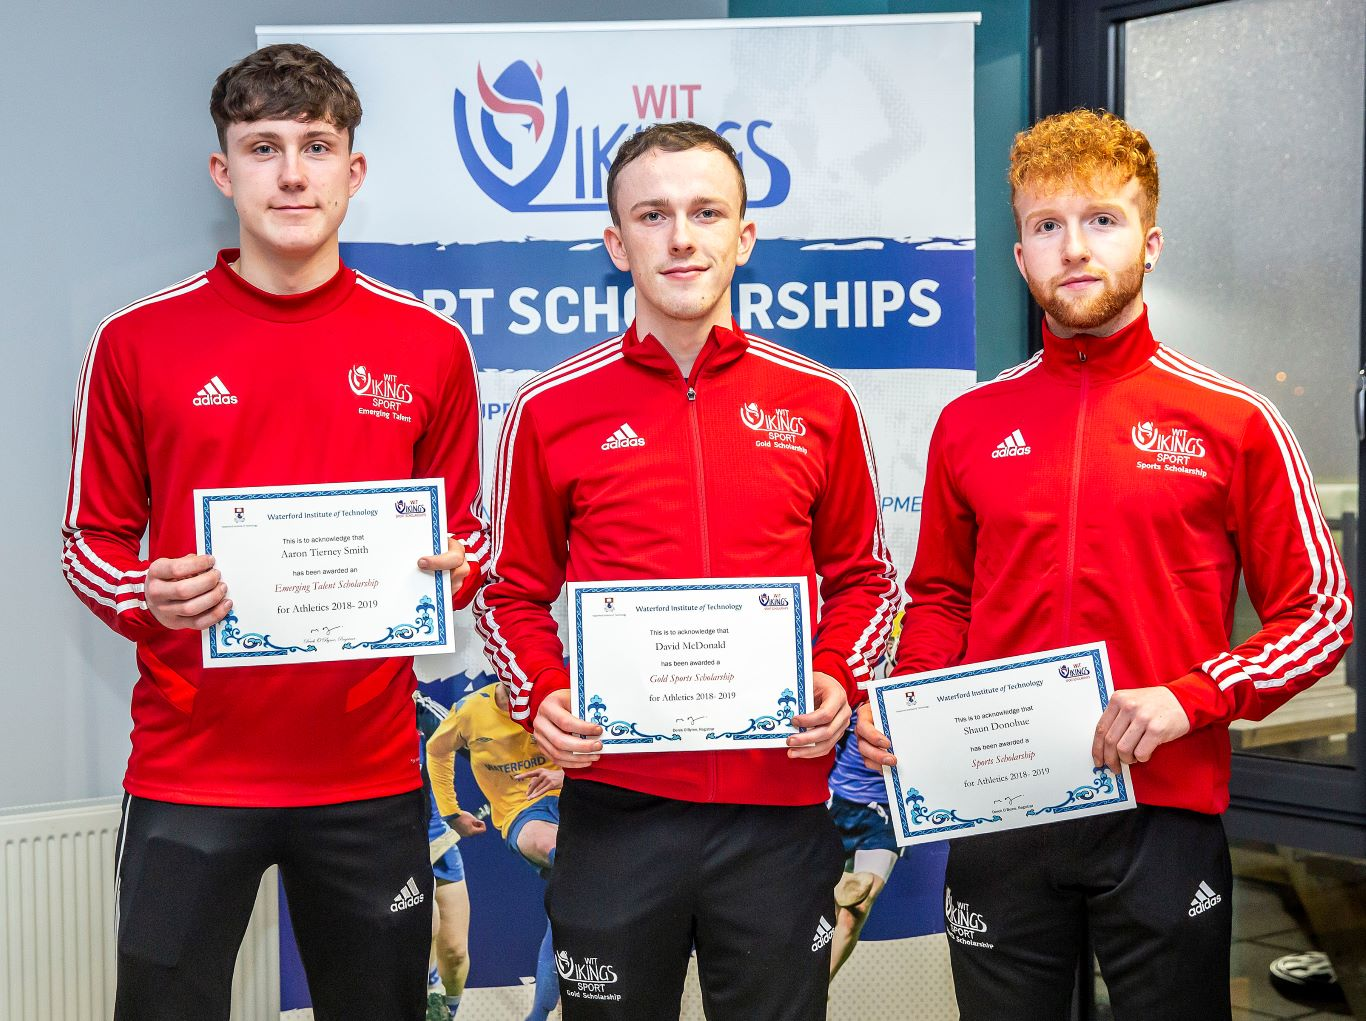 Sport scholarship: Aaron Tierney Smith